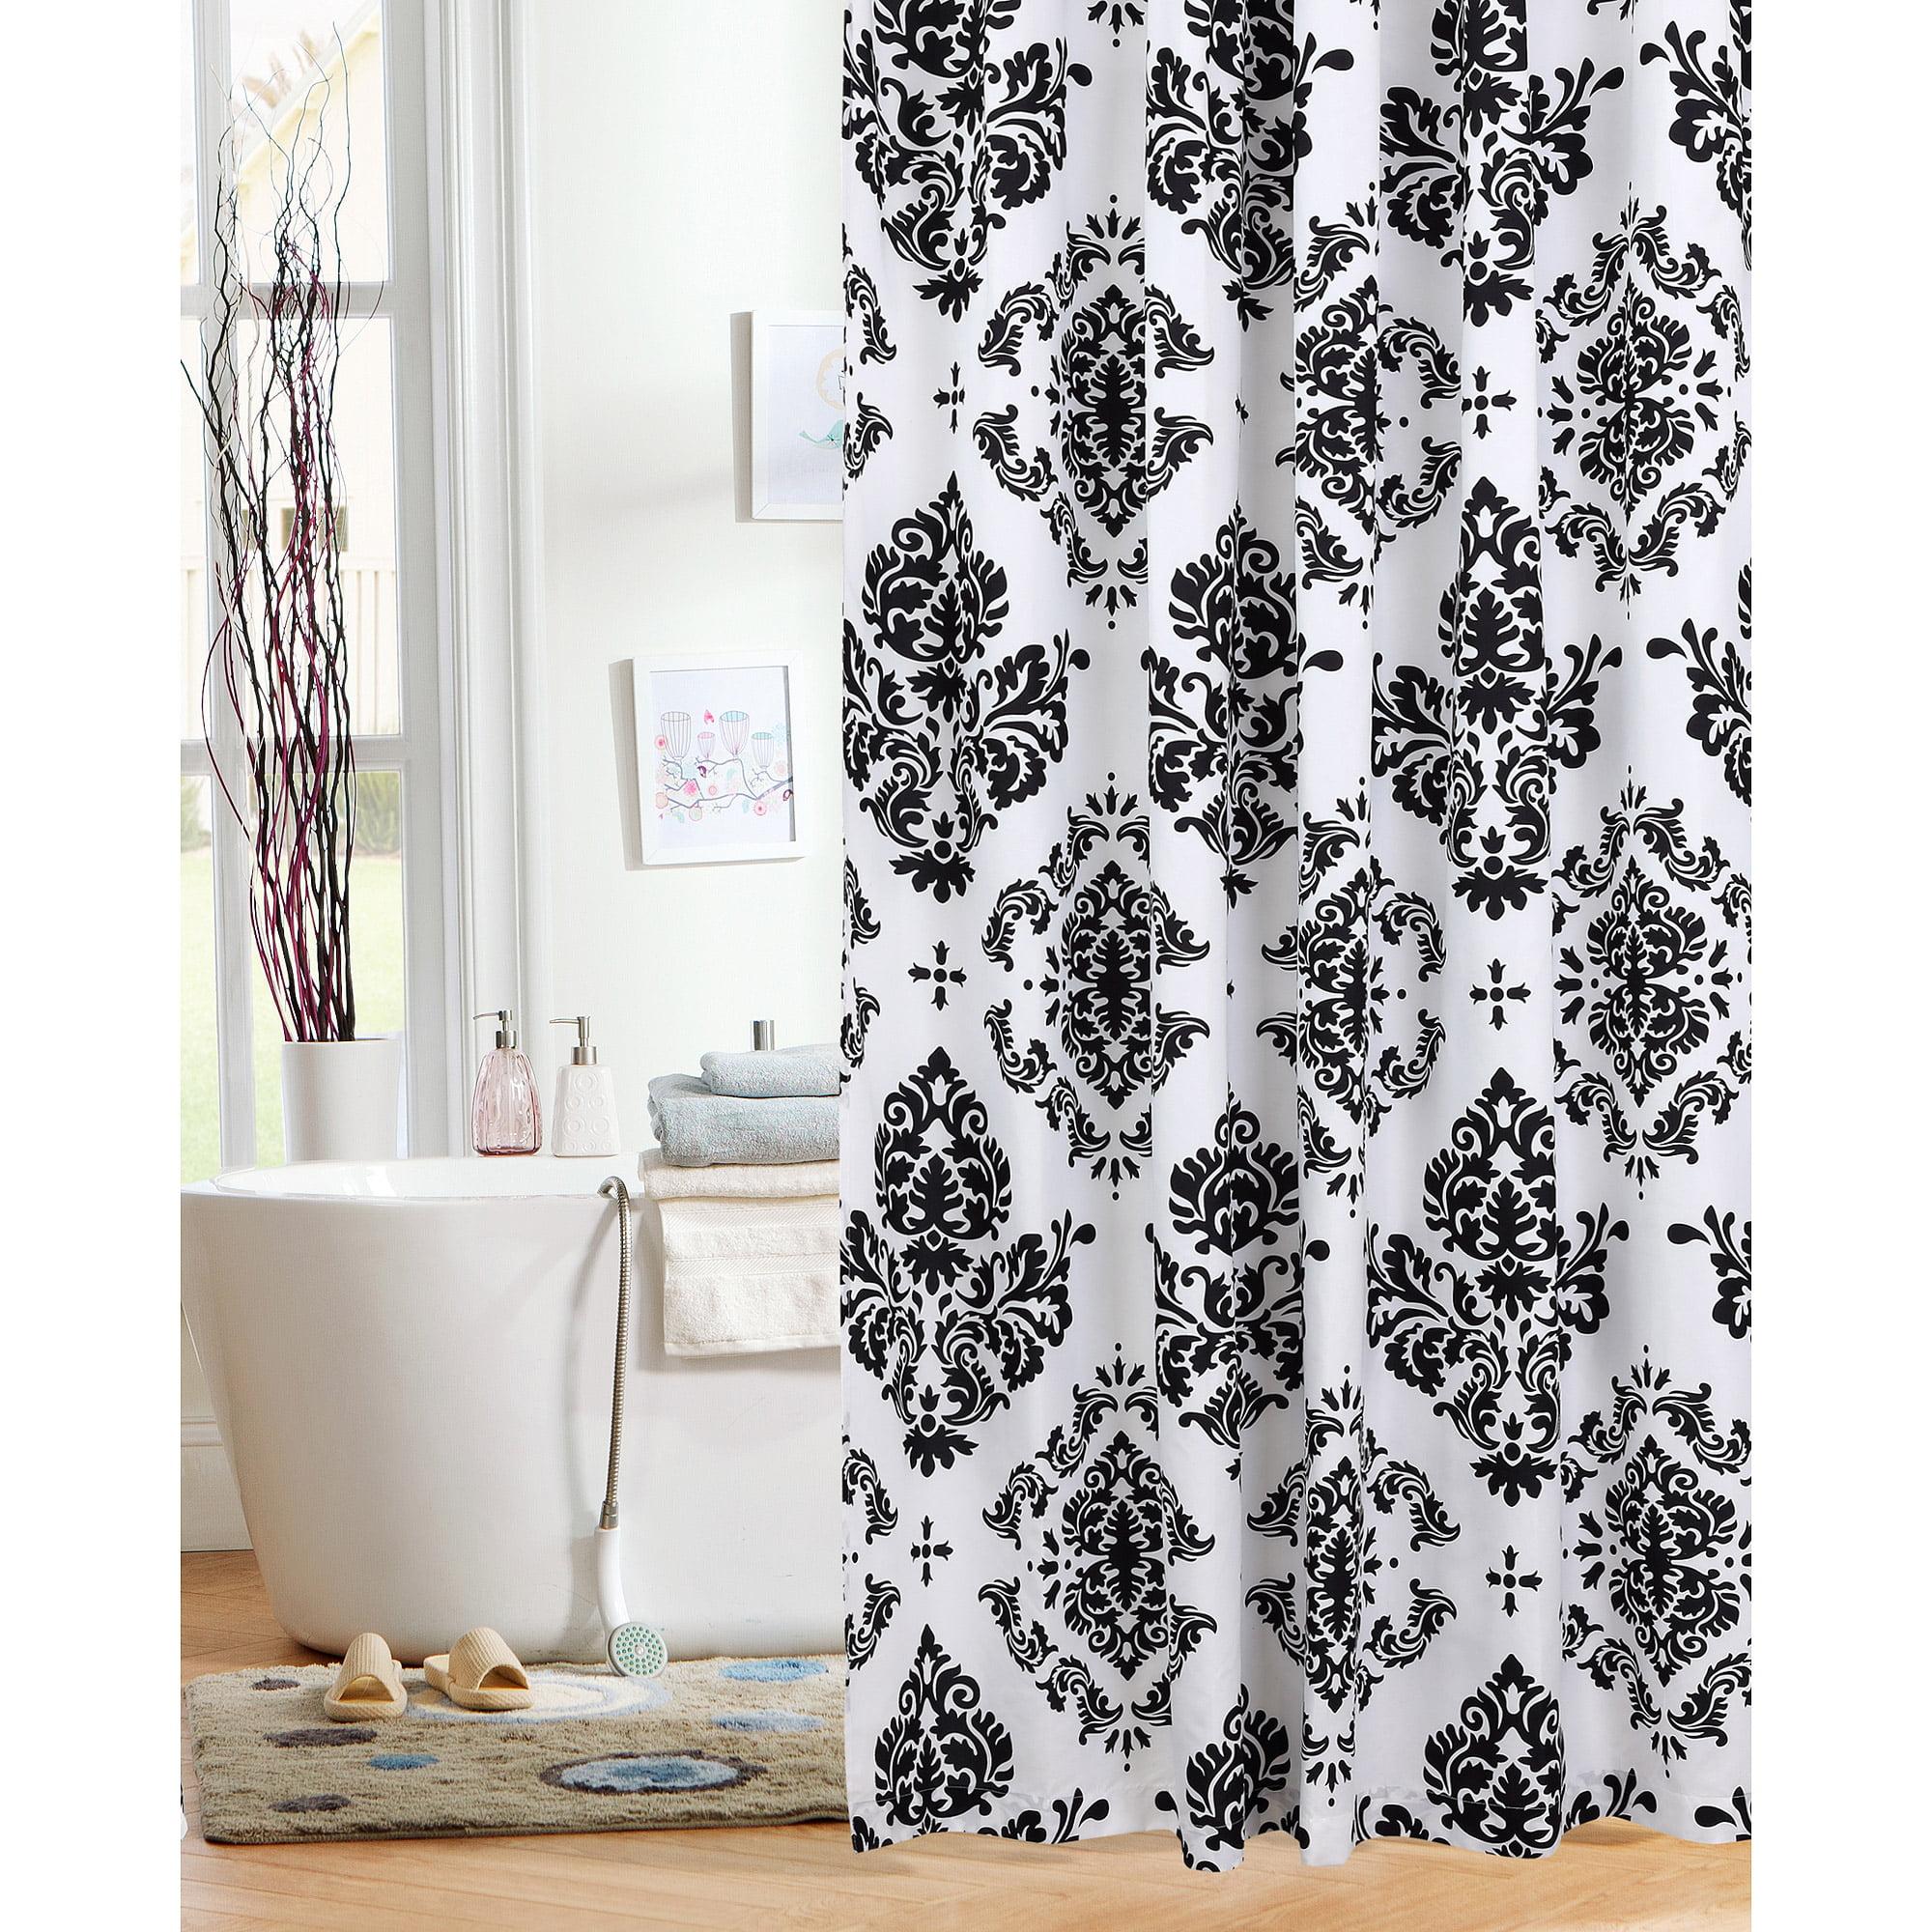 Mainstays Classic Noir Fabric Shower Curtain